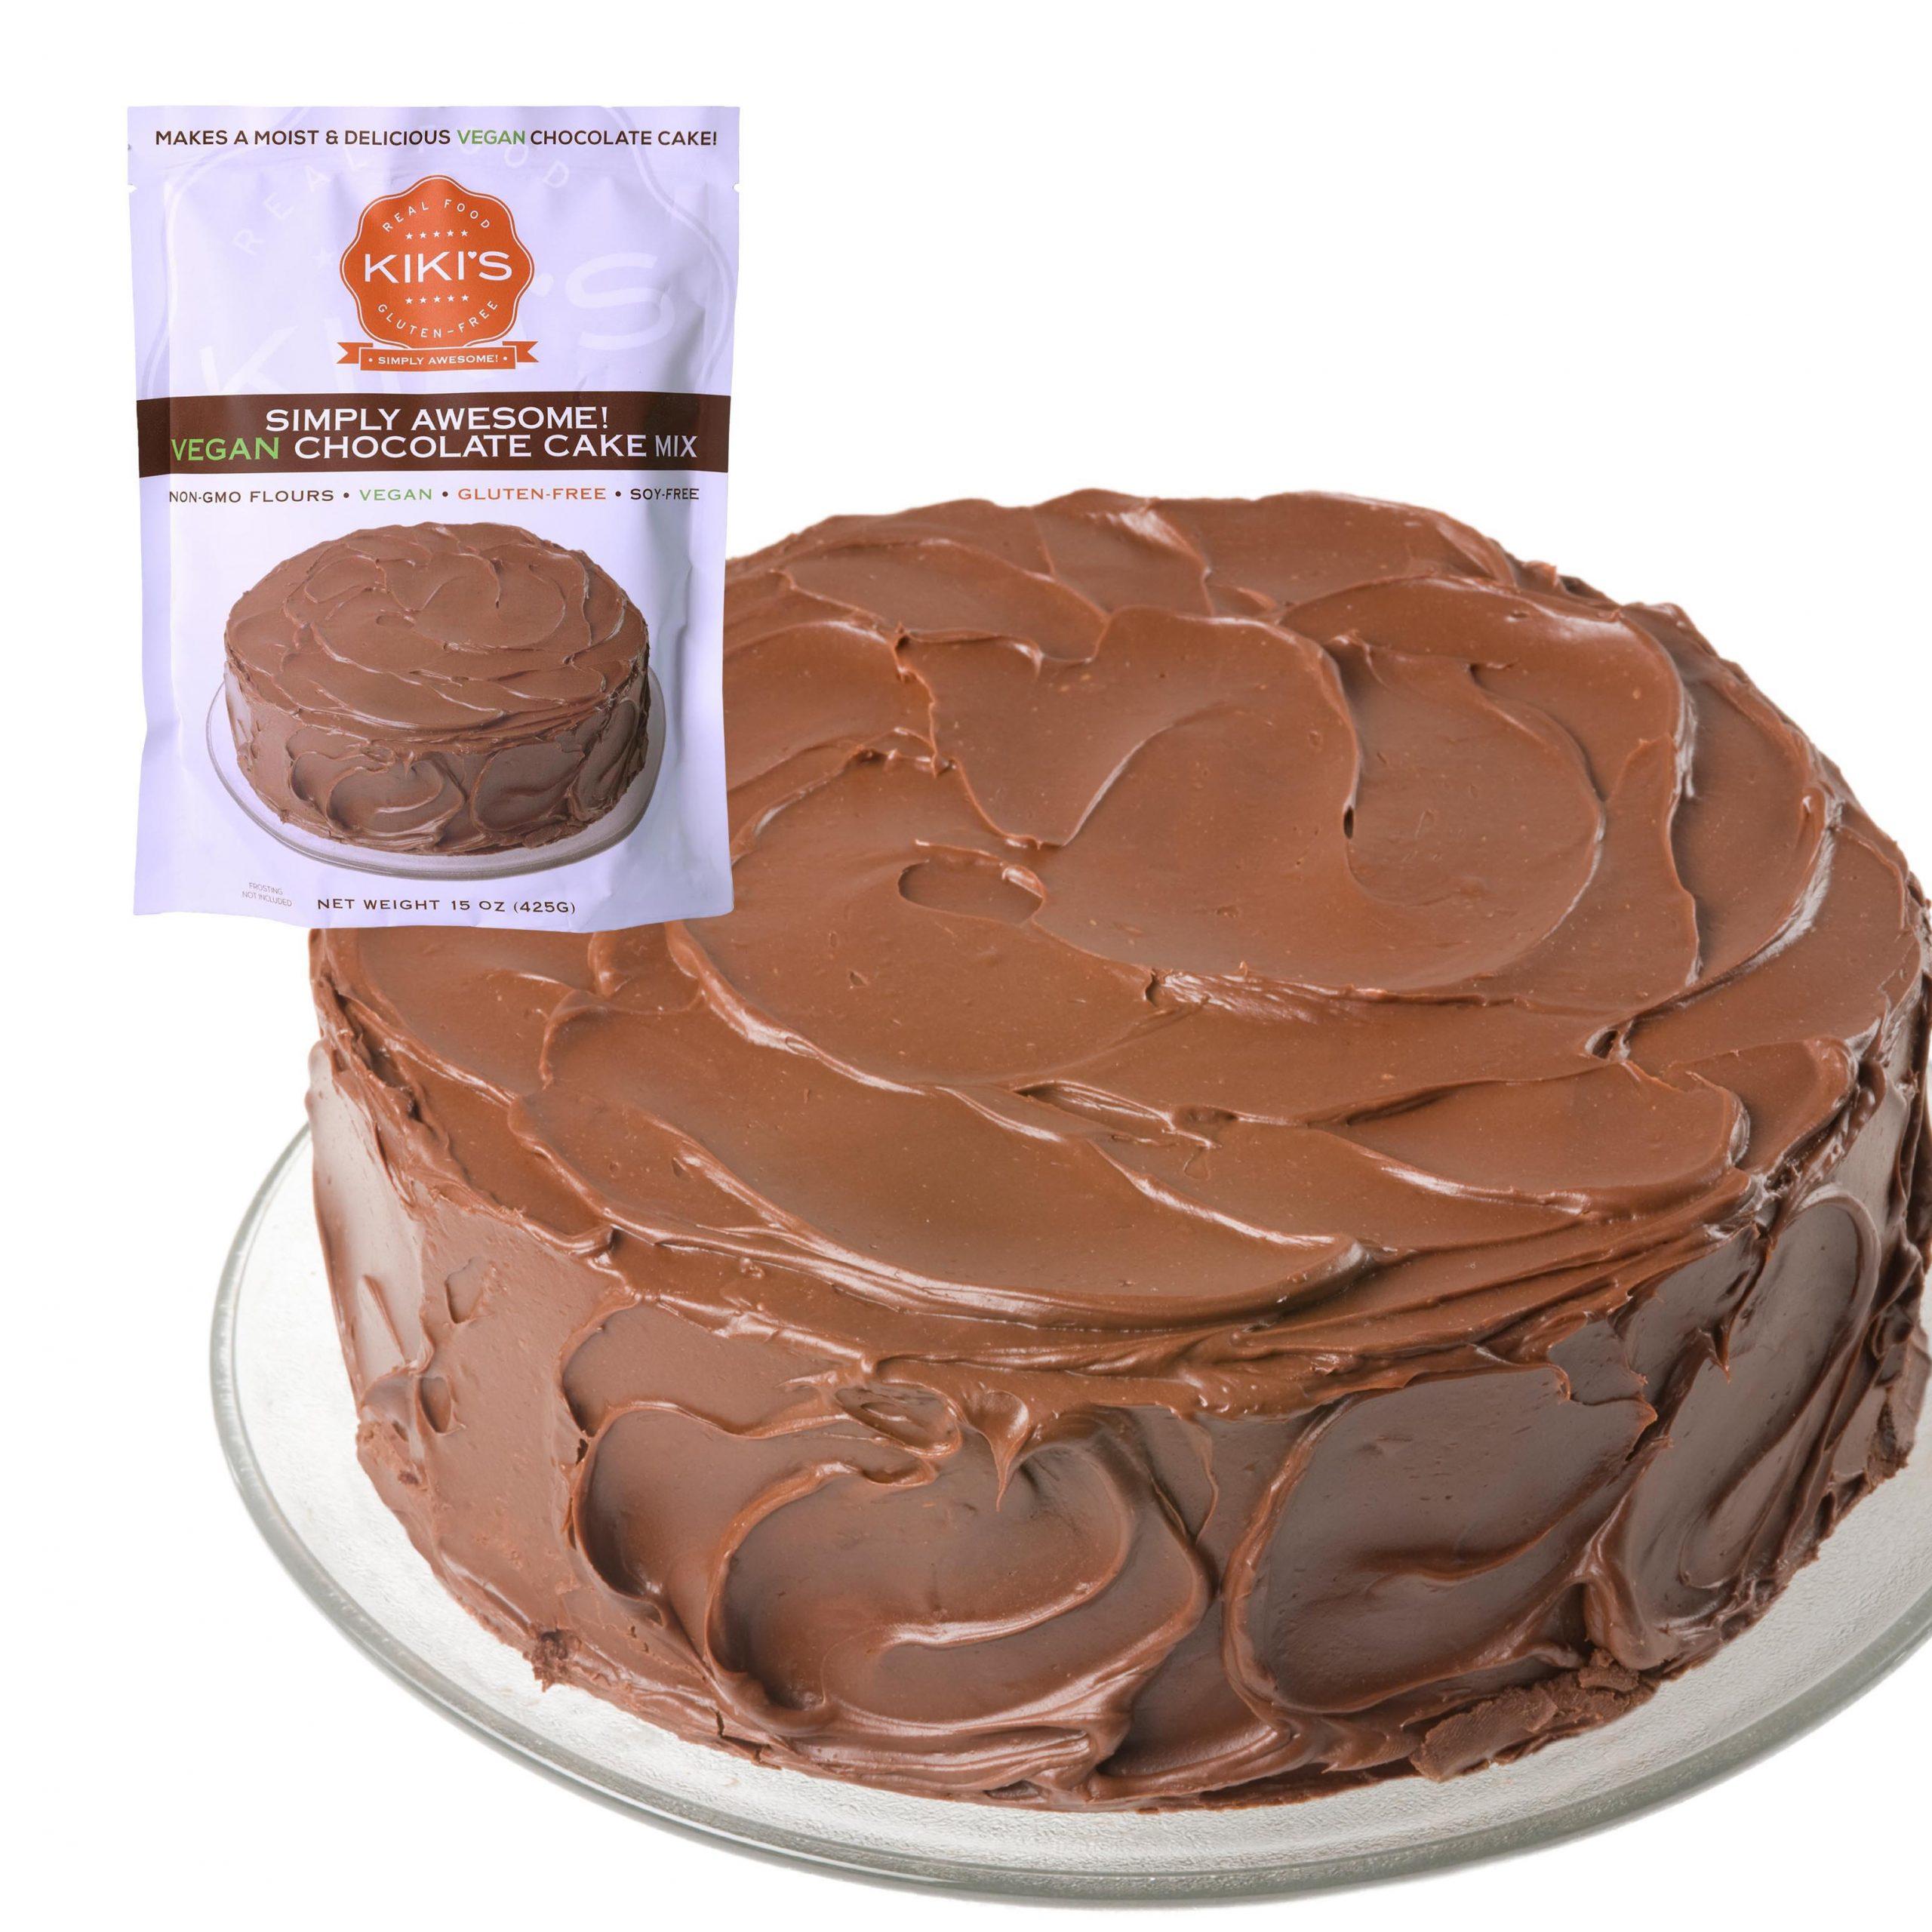 Kiki's Plated Chocolate Cake 3 Feature no V